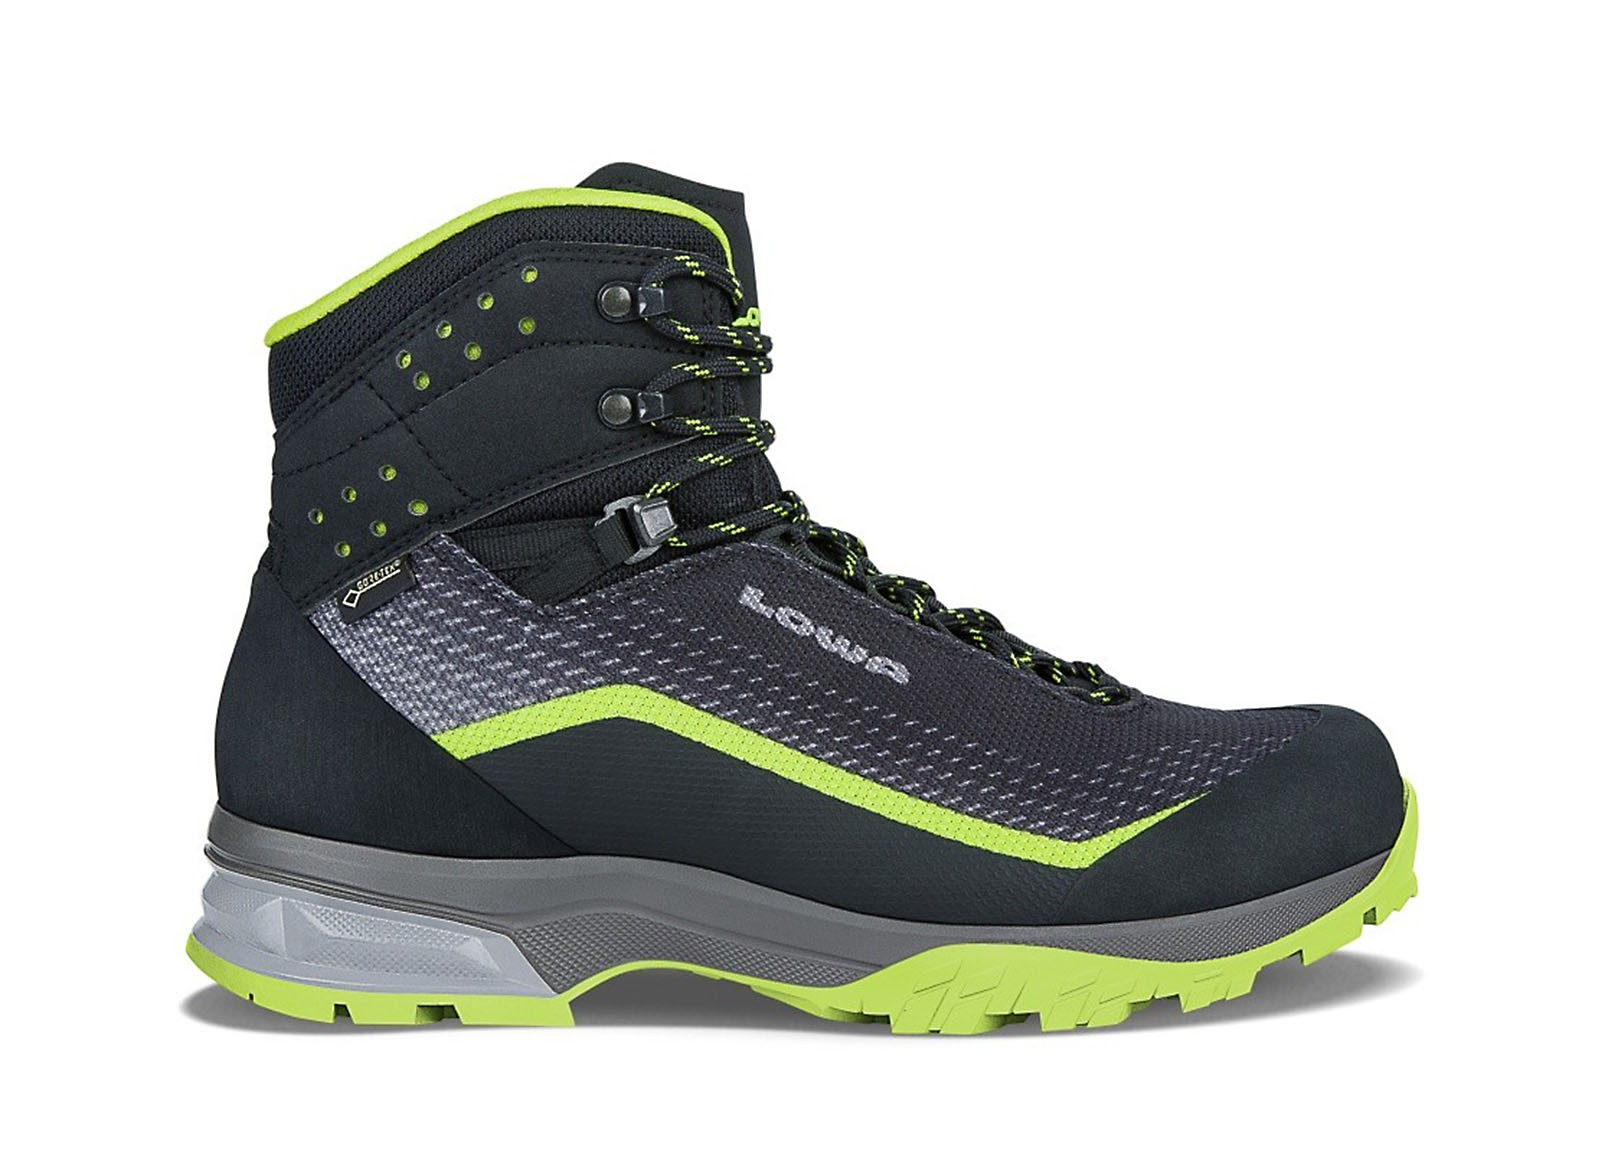 lowa walking boots sale